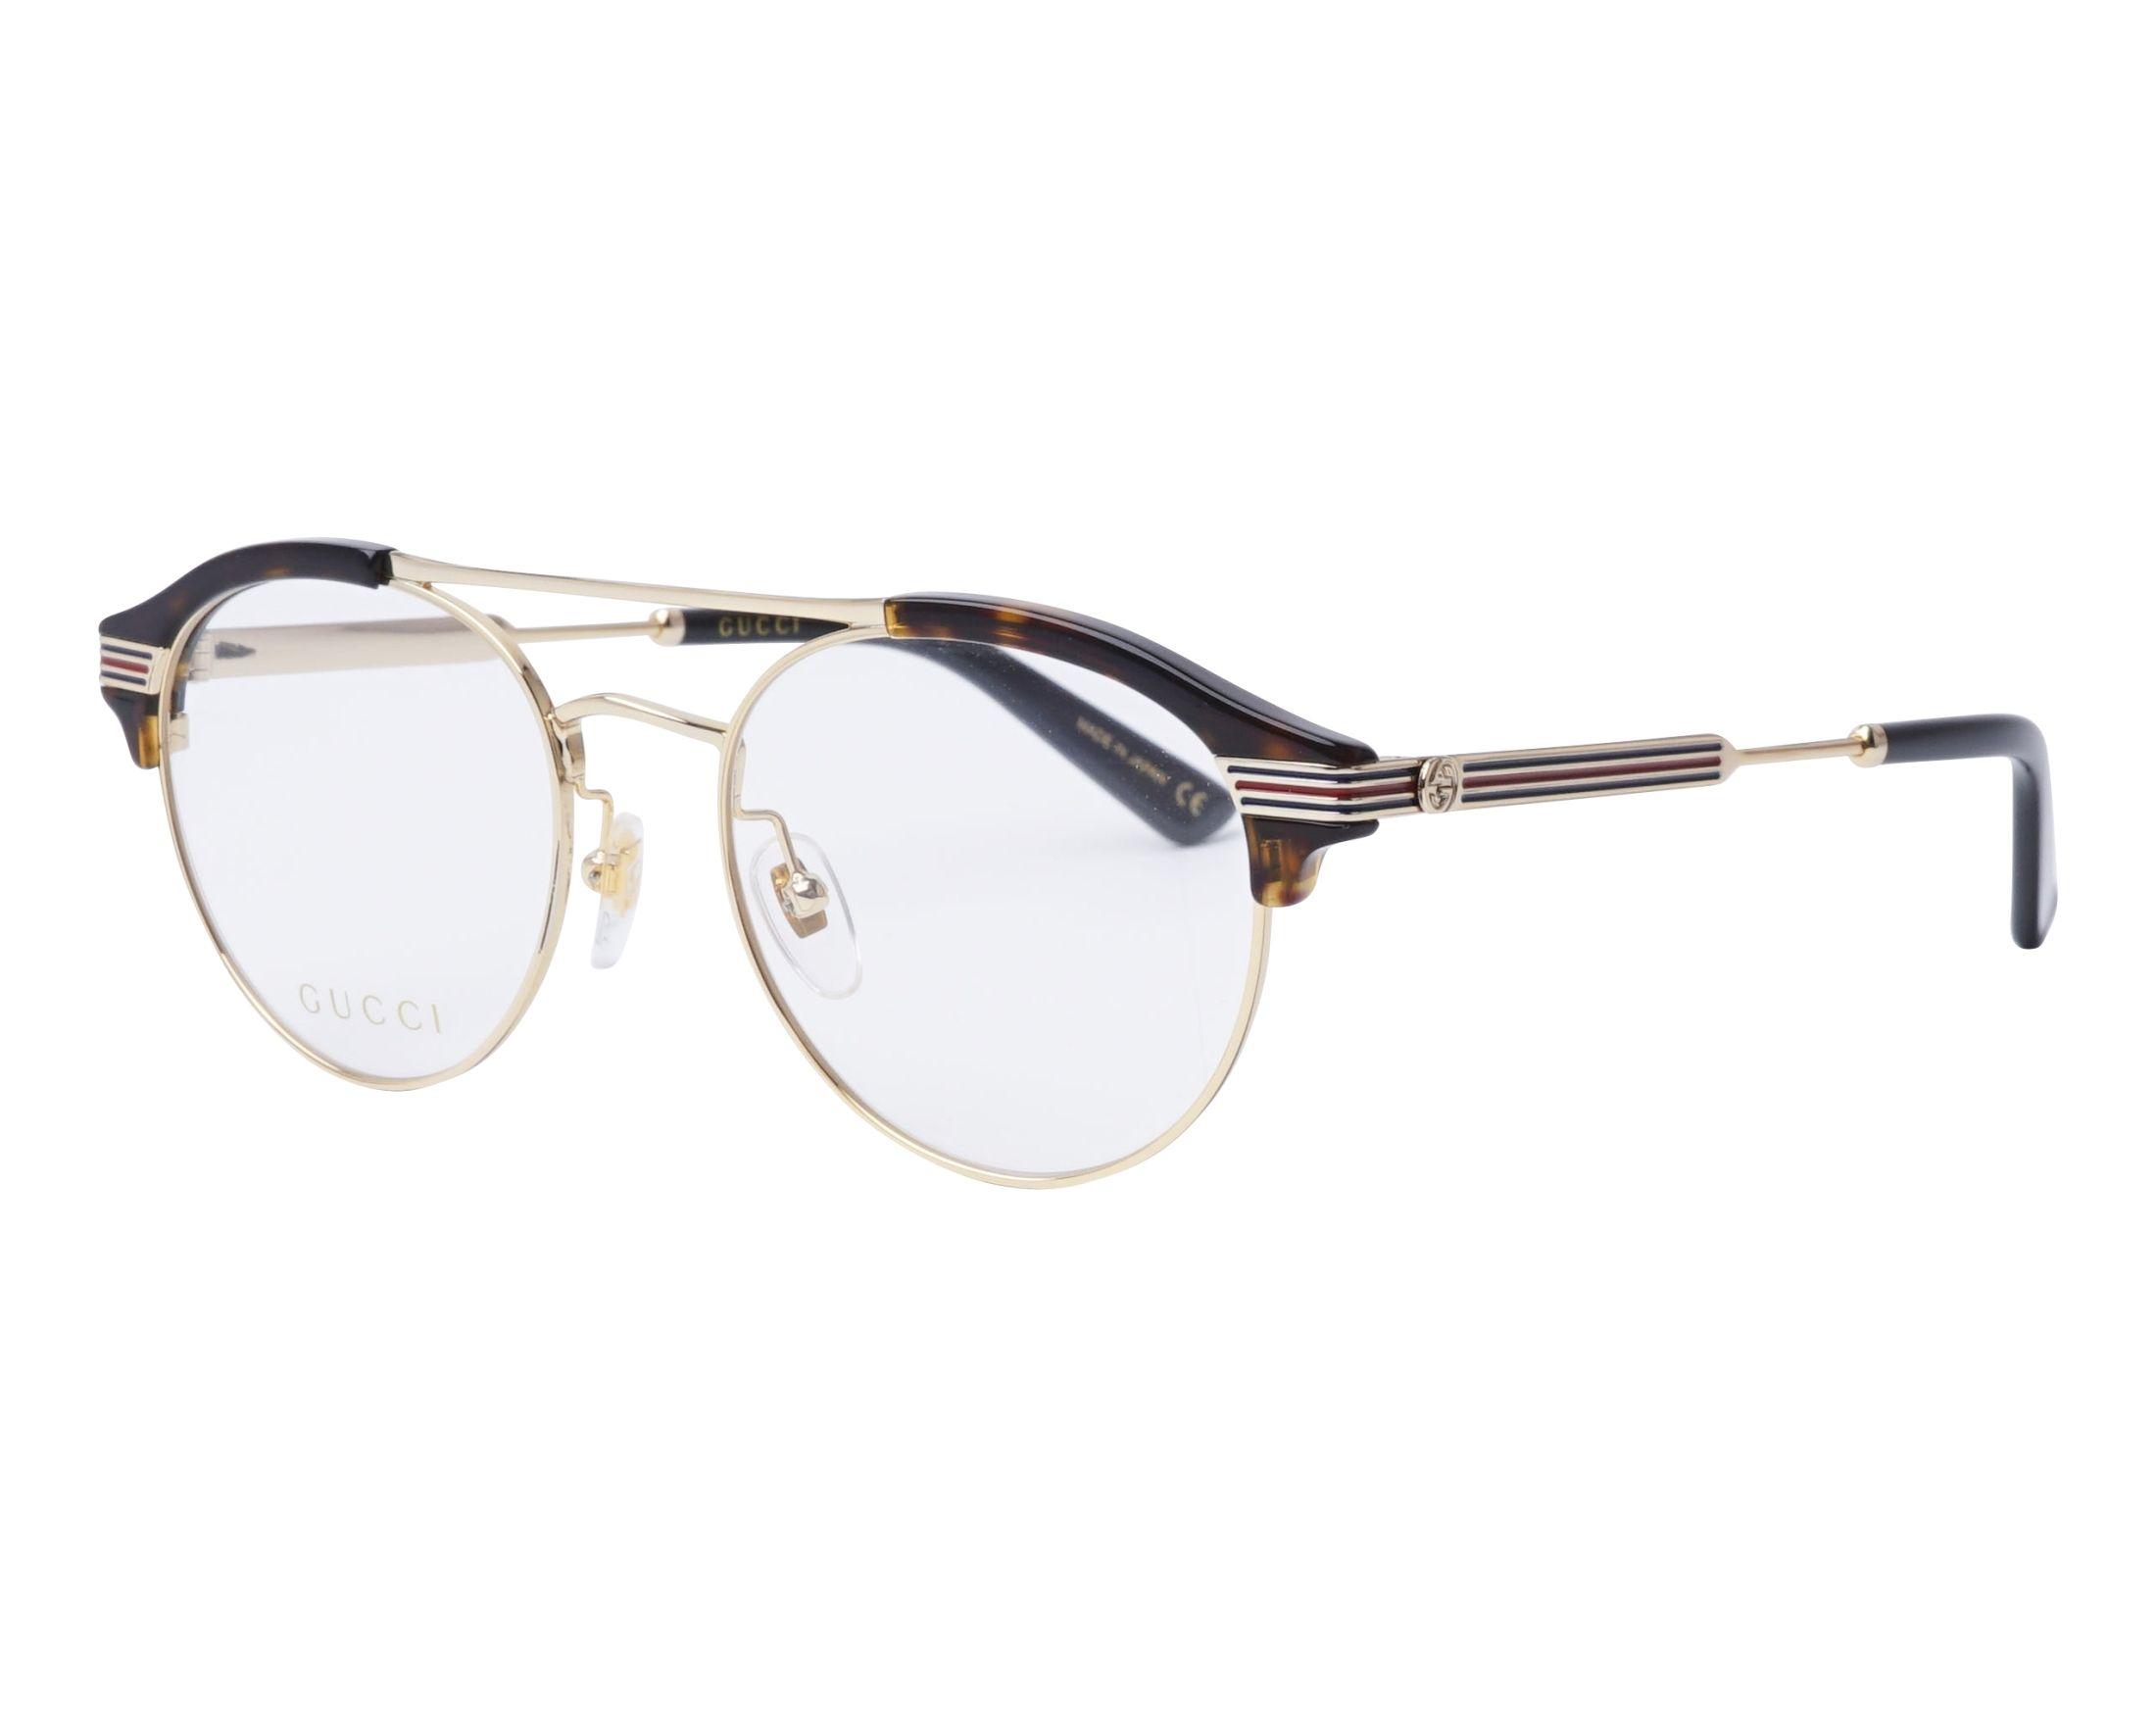 Gucci Eyeglasses Gold GG-0289-O 002 - Visionet US